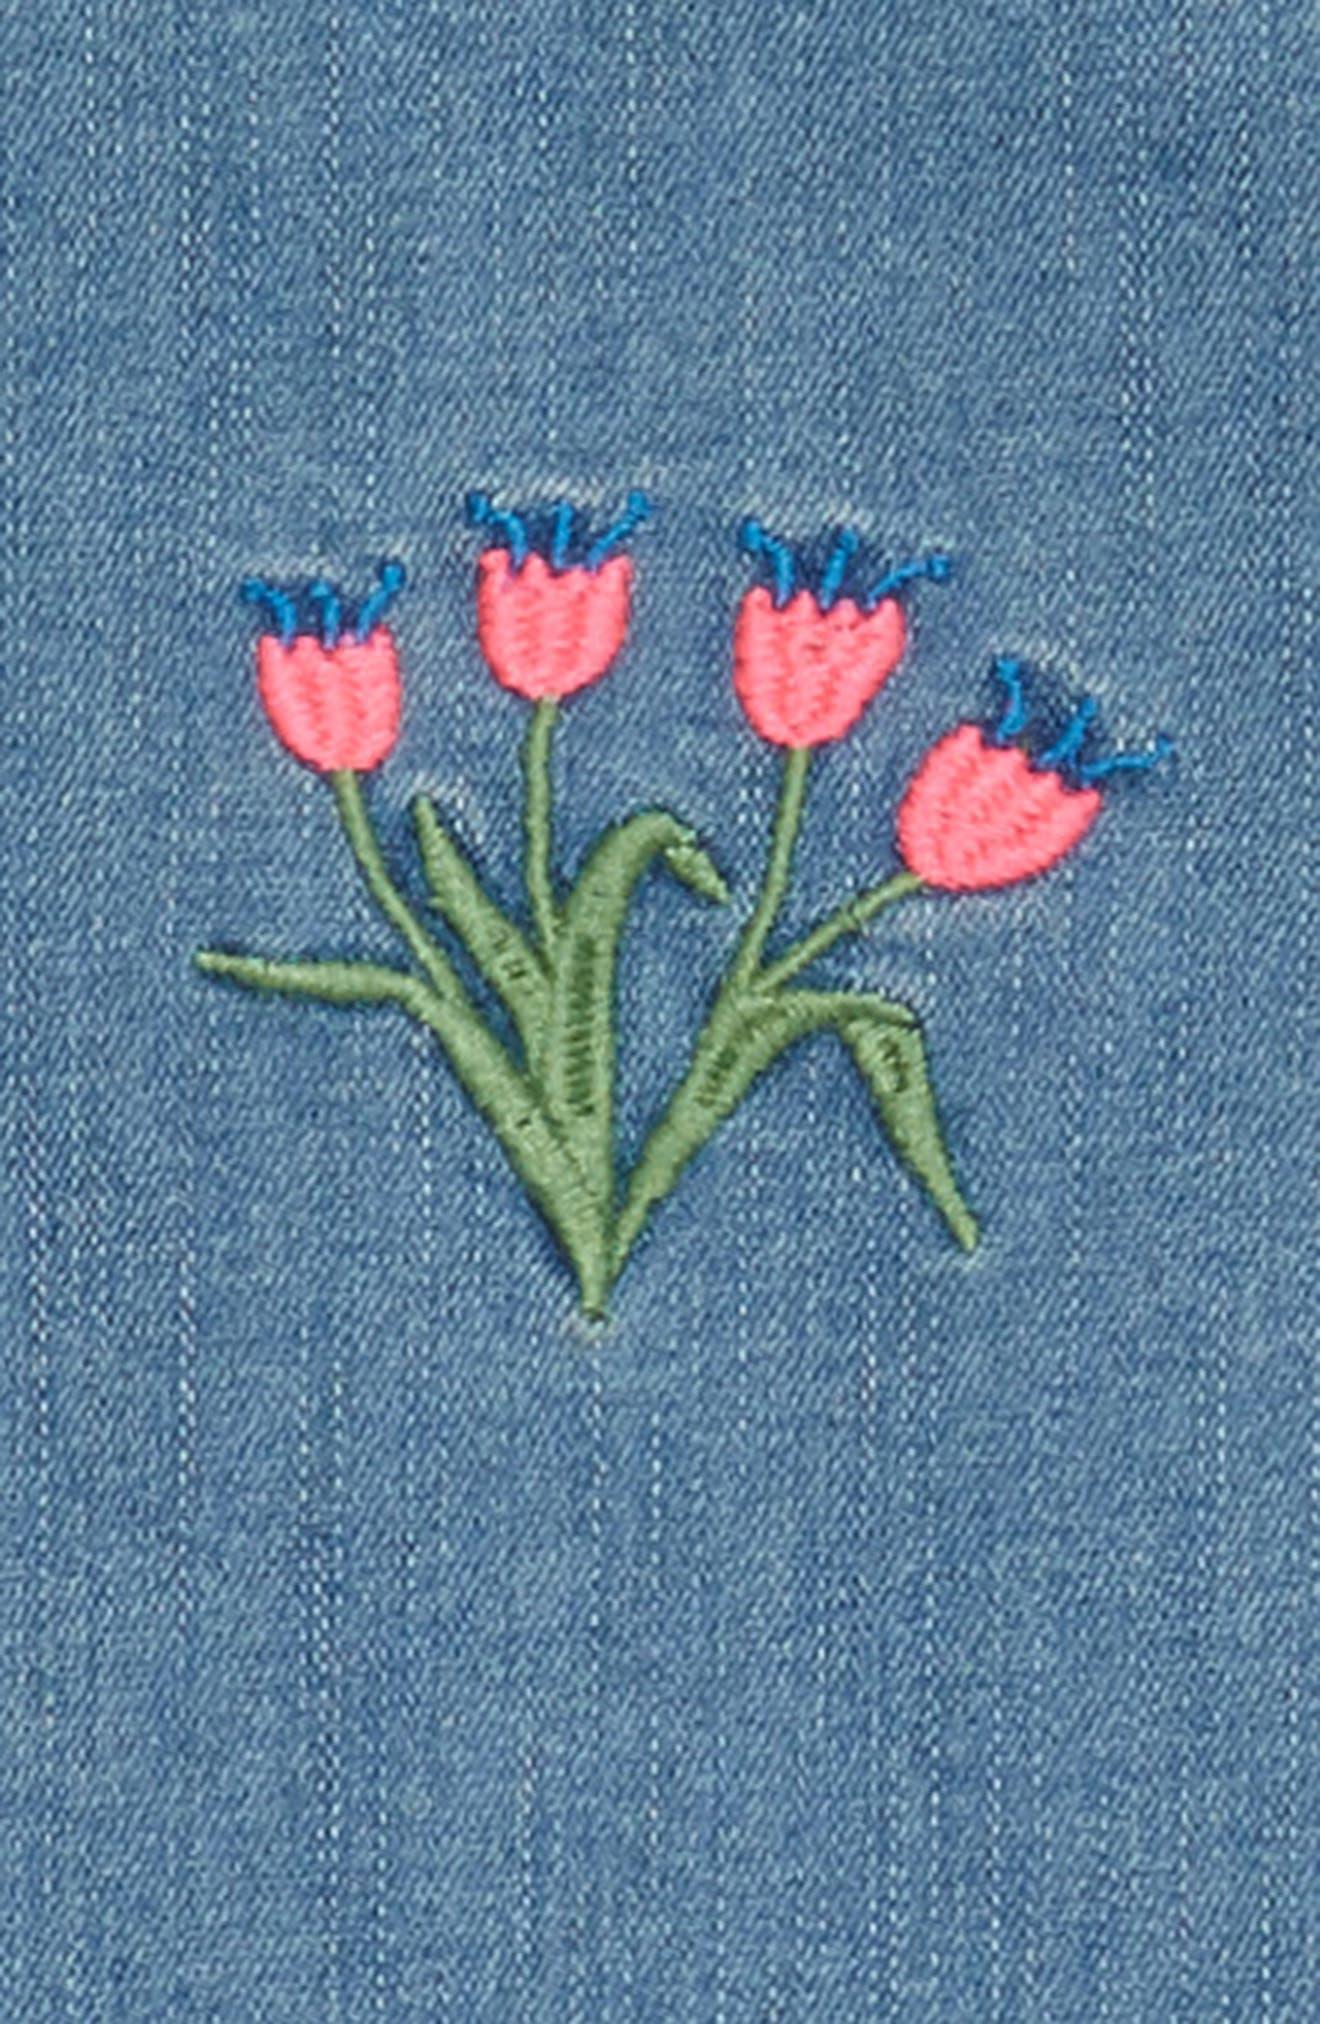 Embroidered Denim Shift Dress,                             Alternate thumbnail 3, color,                             420